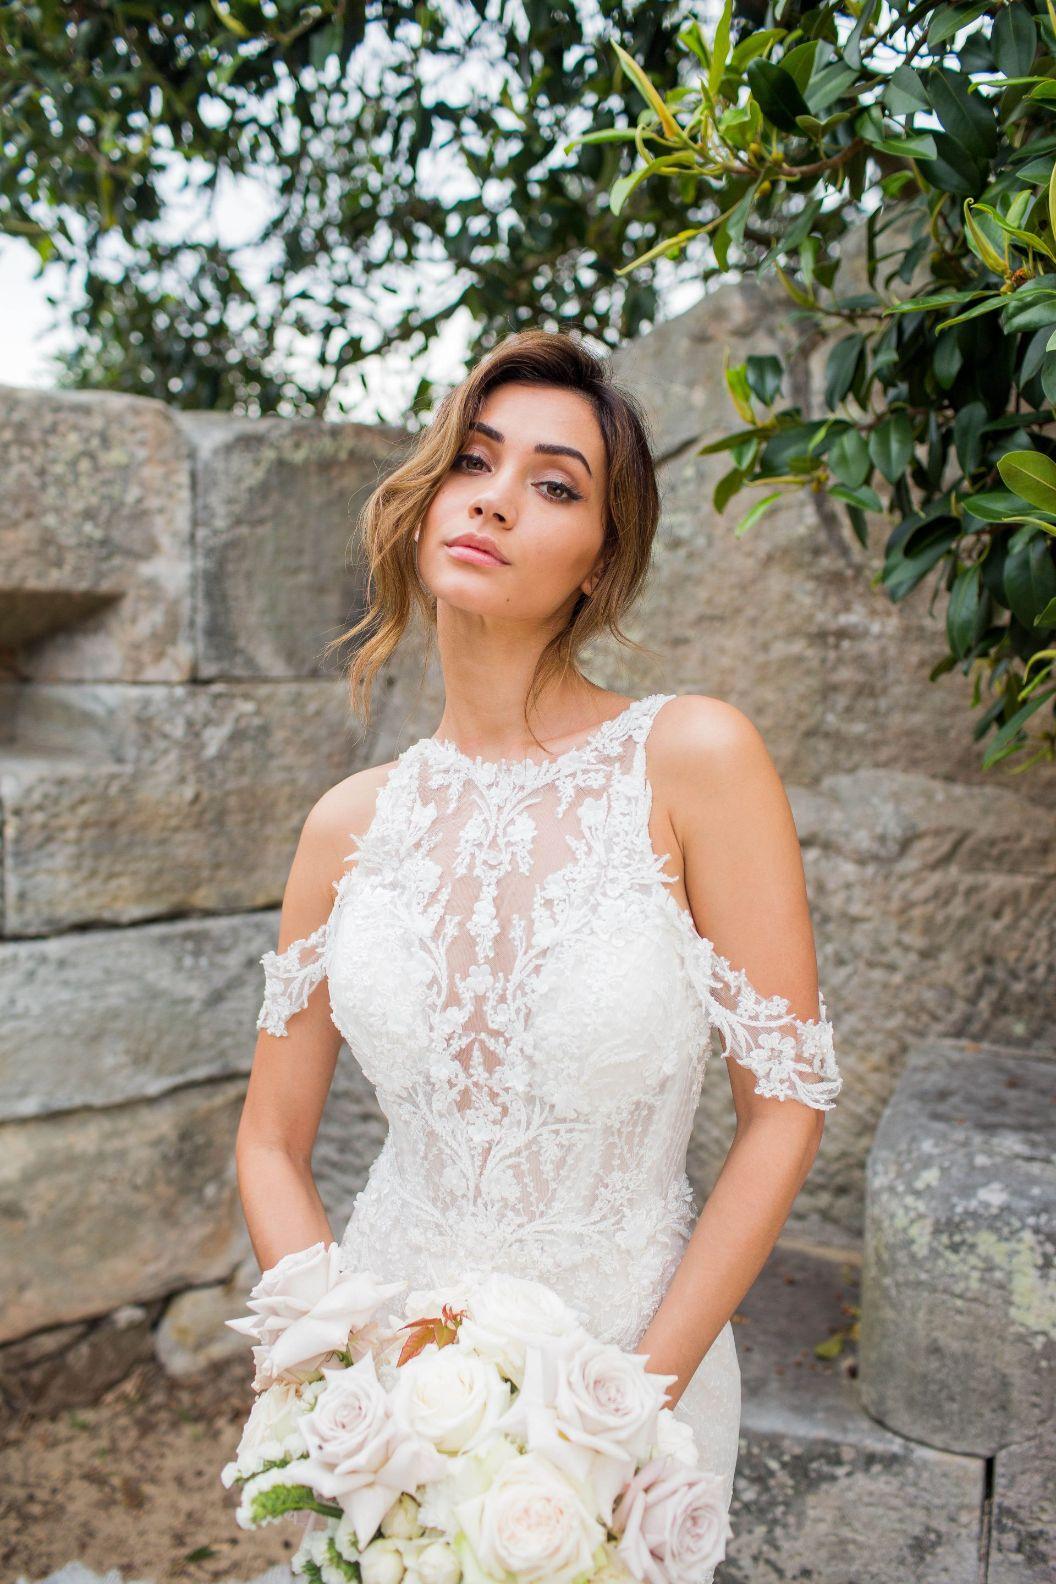 khatira alina couture bridal gown wedding dress australian designer sydney bride